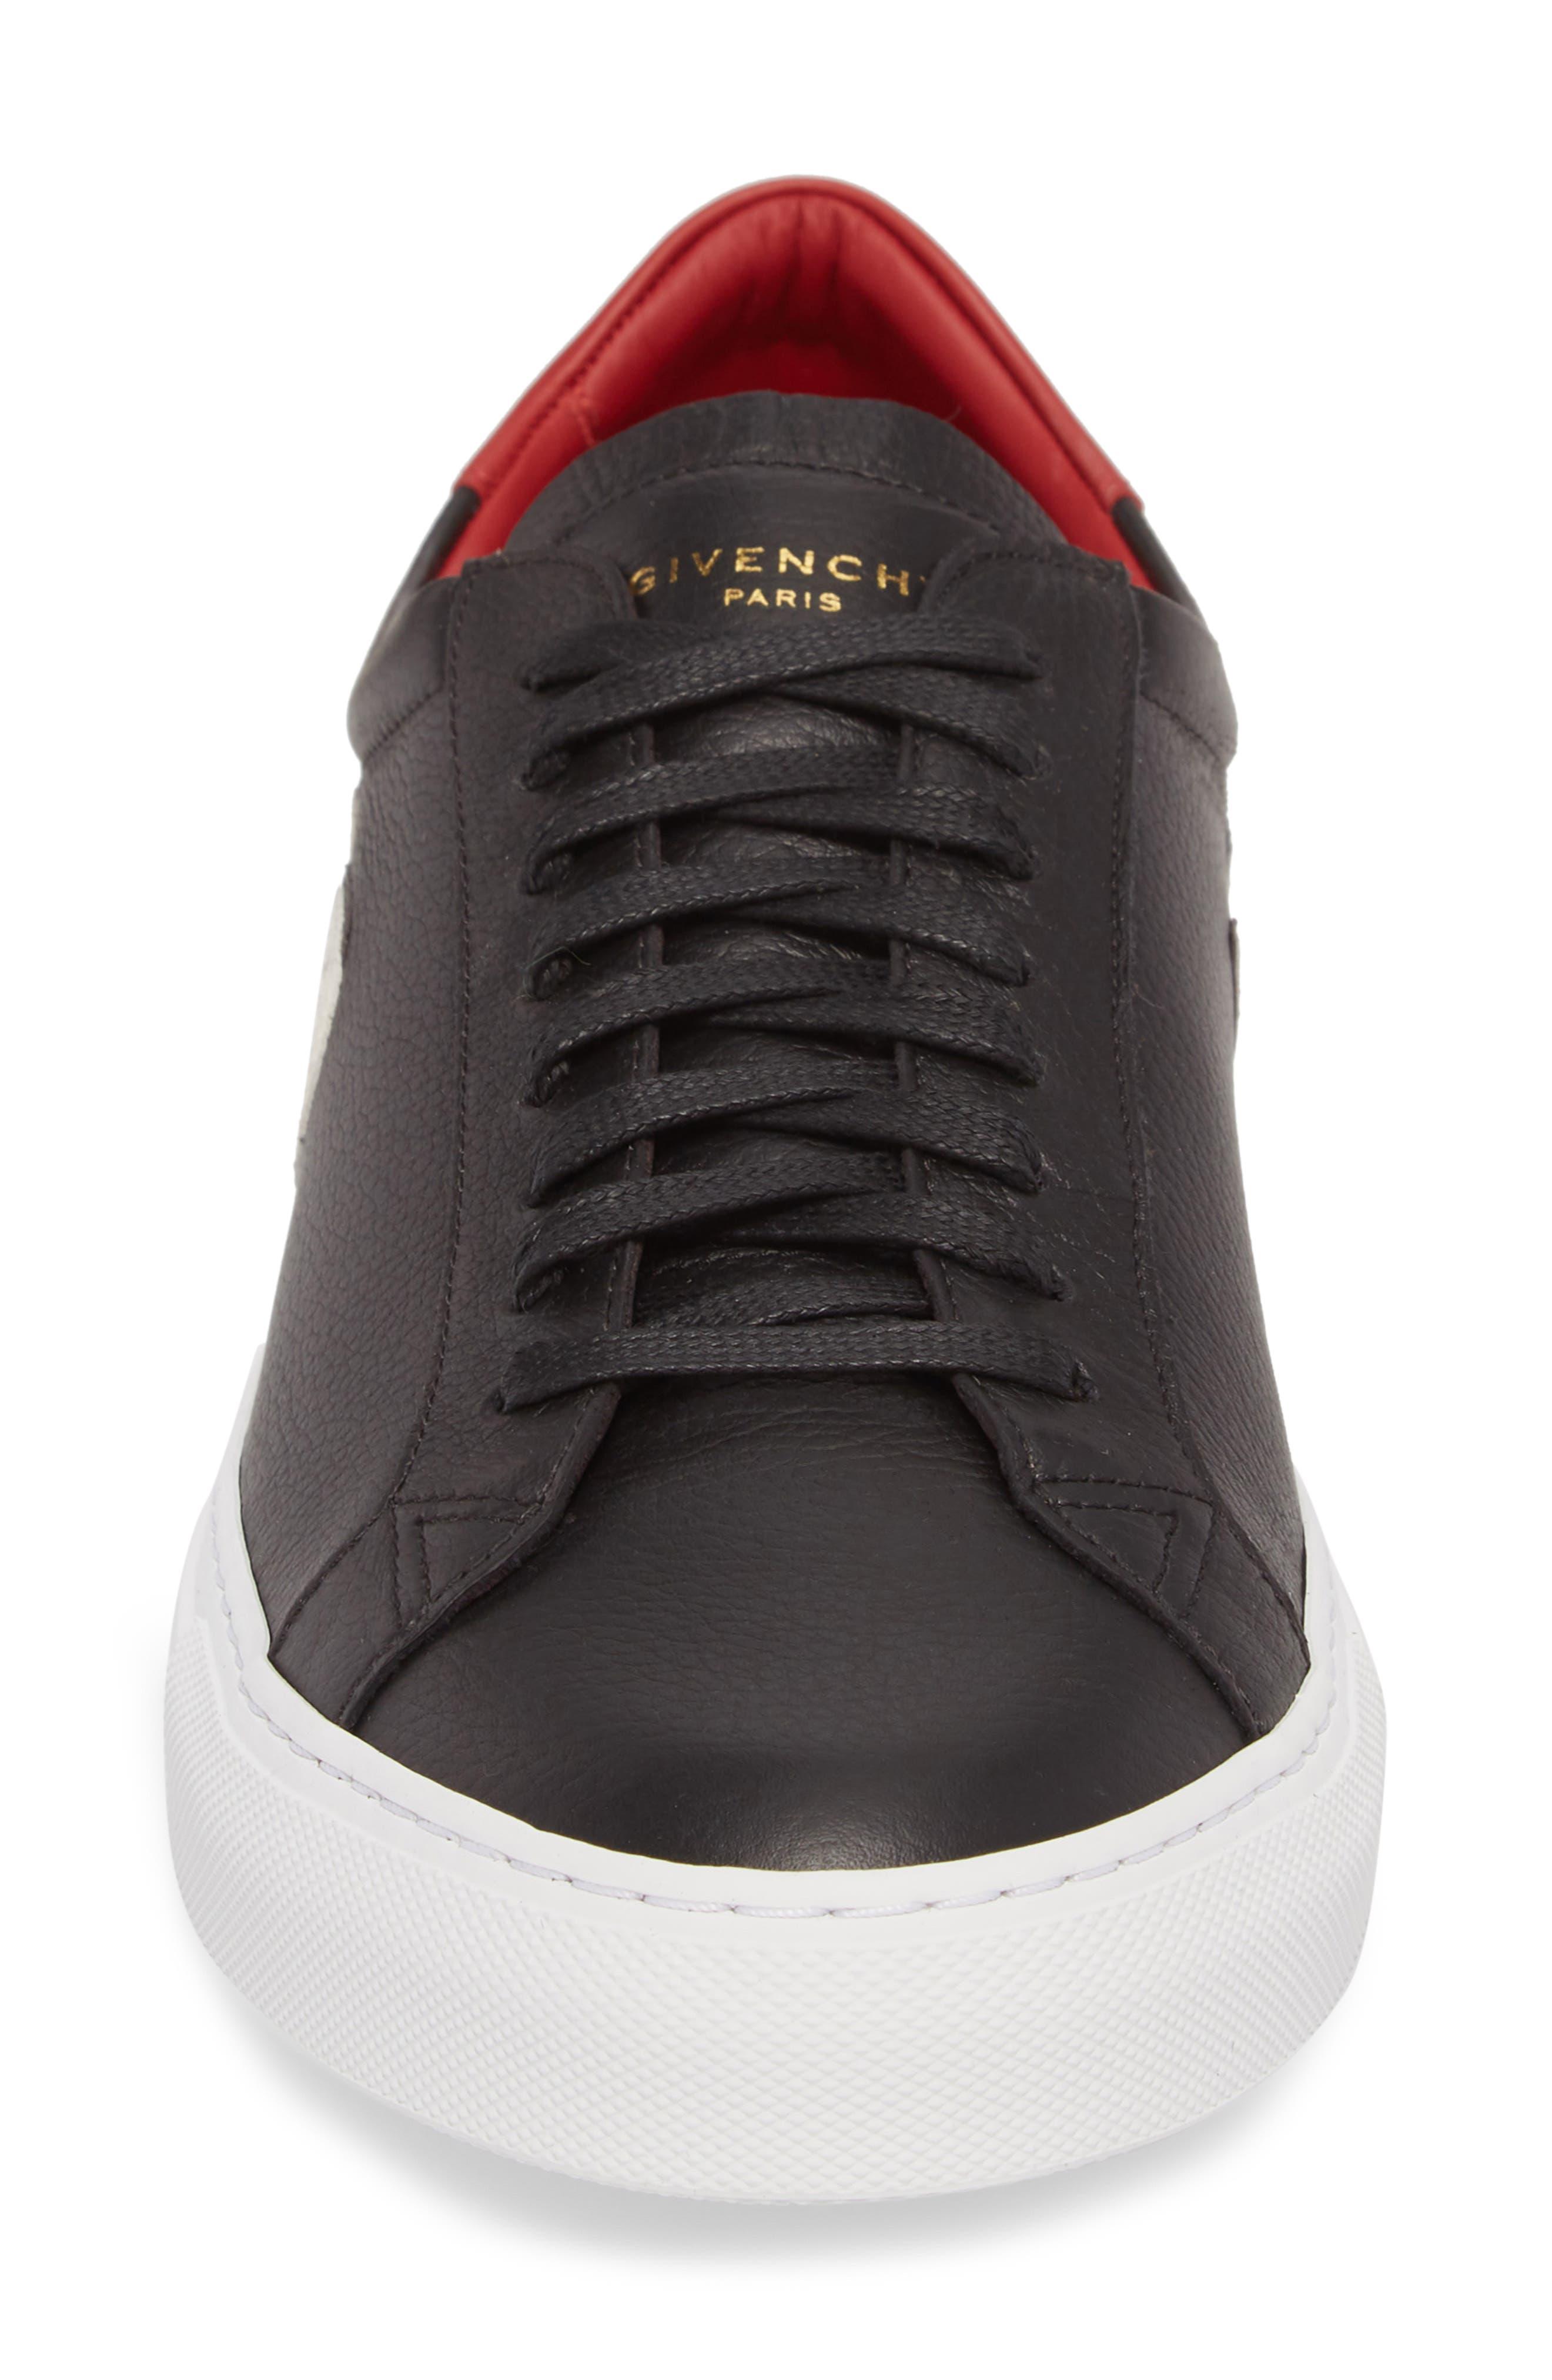 Urban Street Upside Down Sneaker,                             Alternate thumbnail 4, color,                             Black/ Red